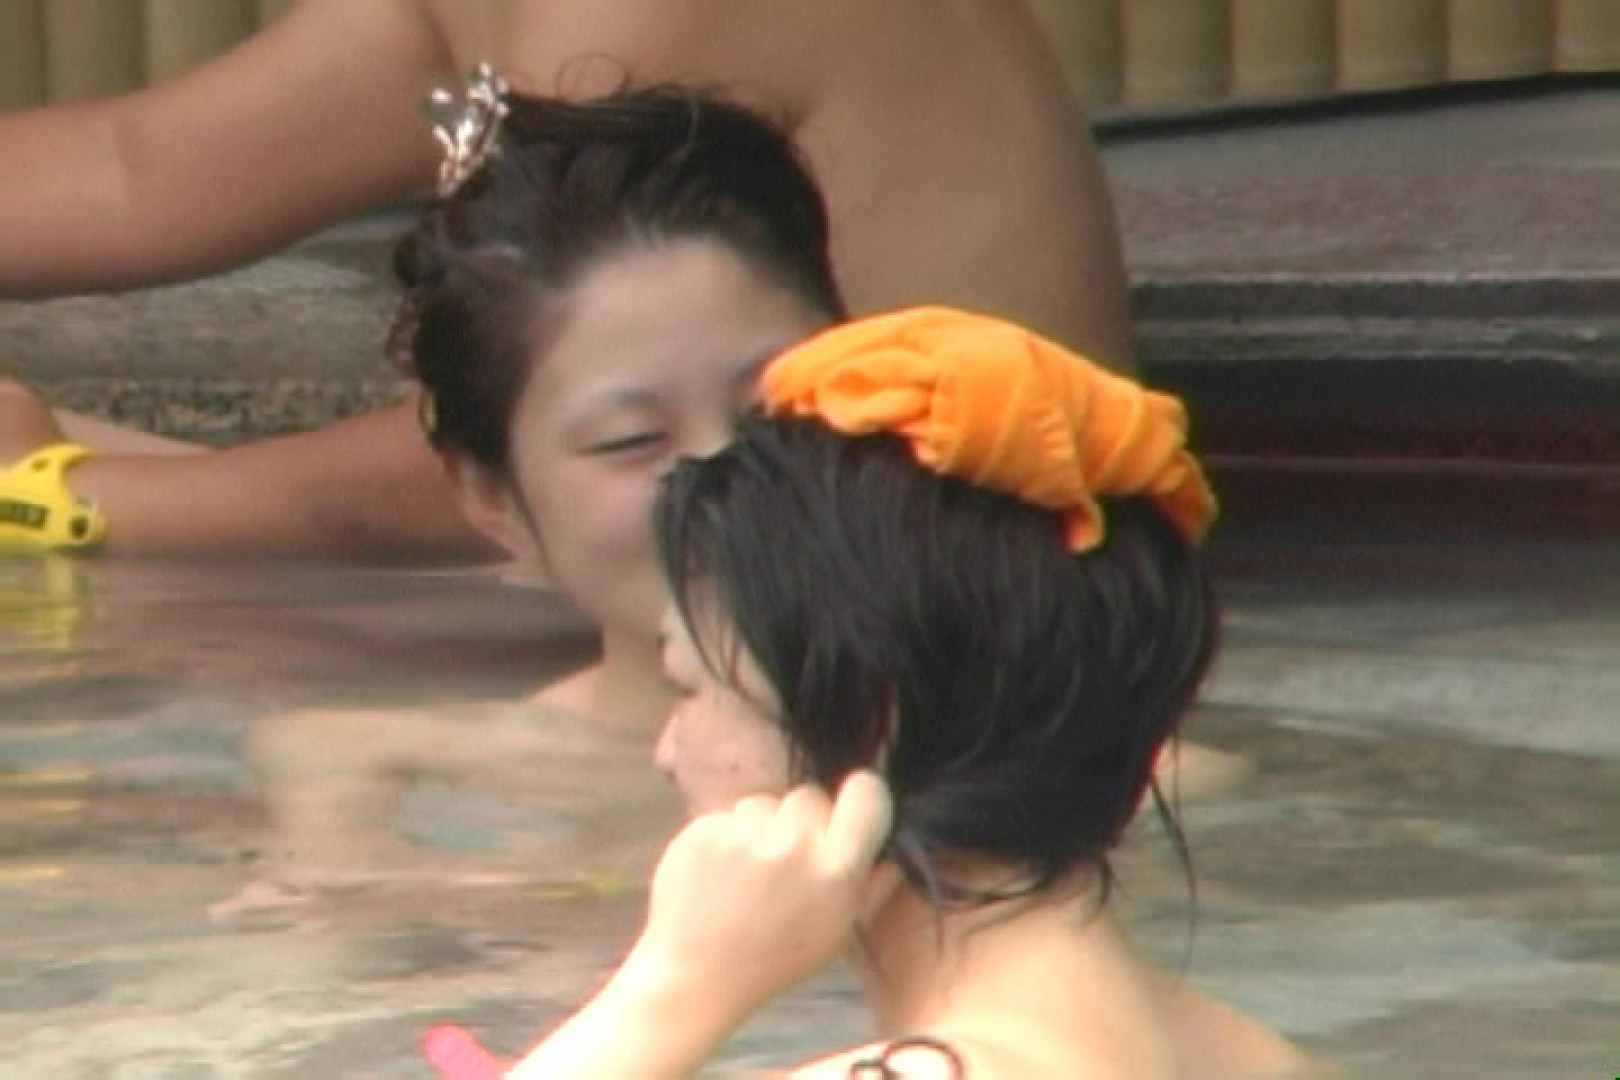 Aquaな露天風呂Vol.40【VIP】 盗撮 | OLセックス  66画像 46